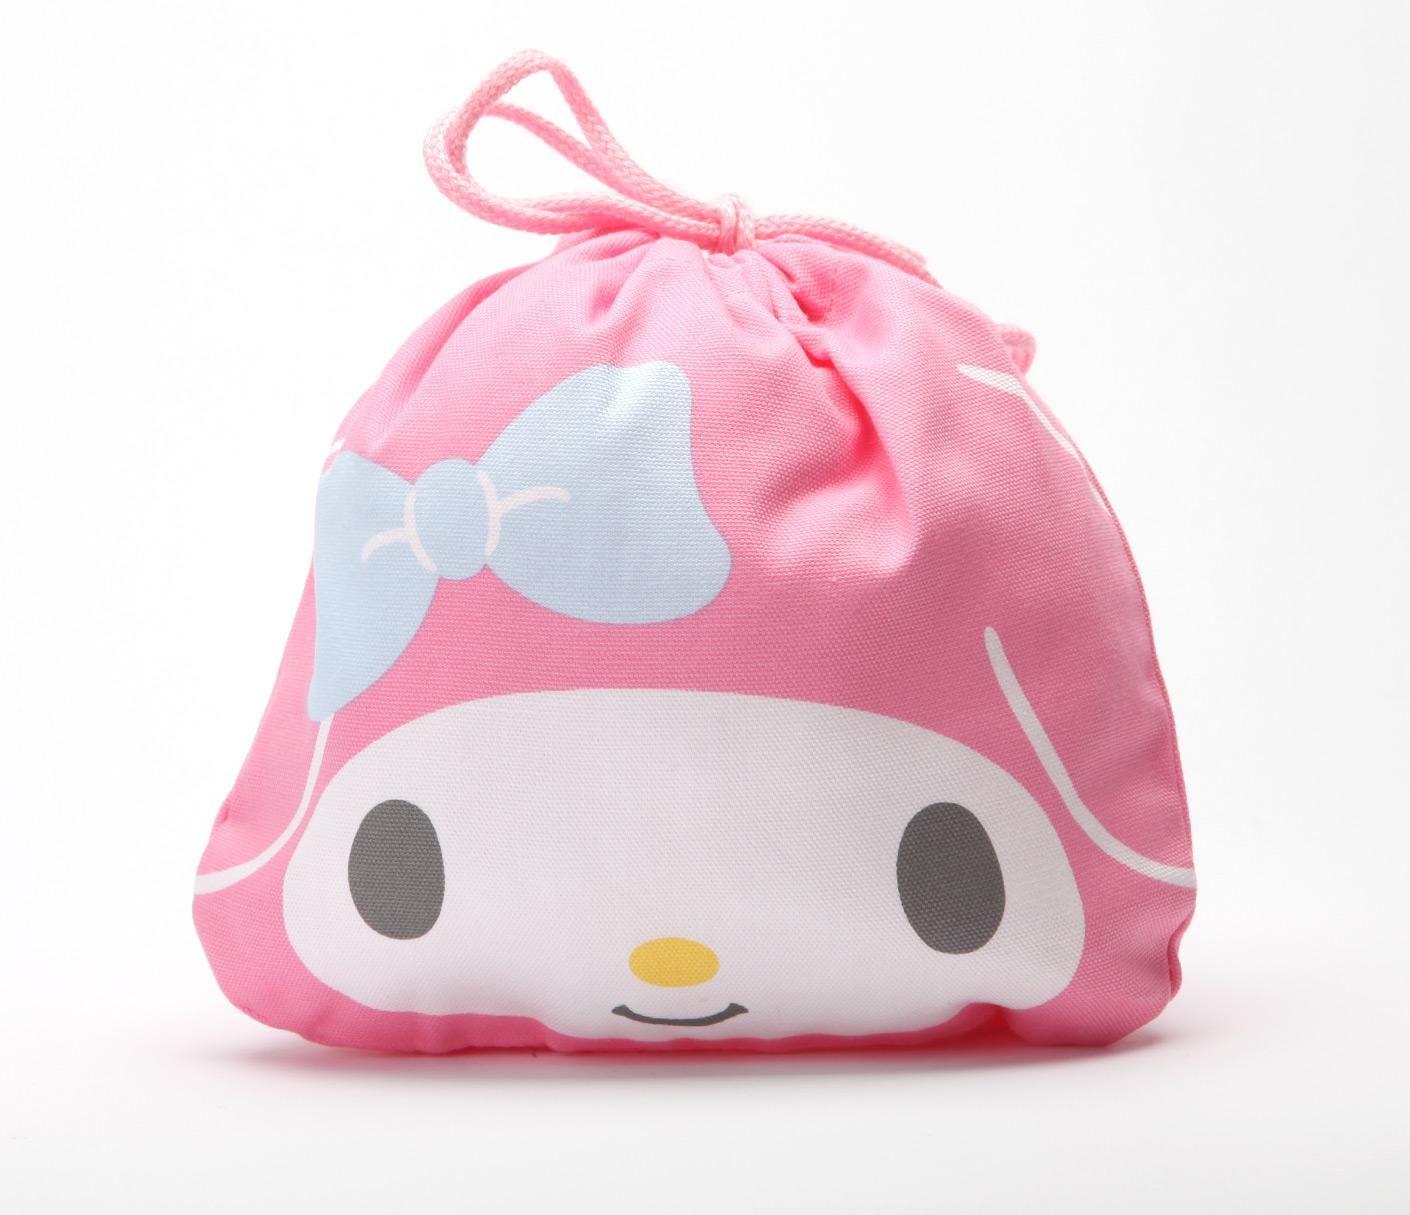 6b2511a78cd0 My Melody Draw-String Bag  Face String Bag